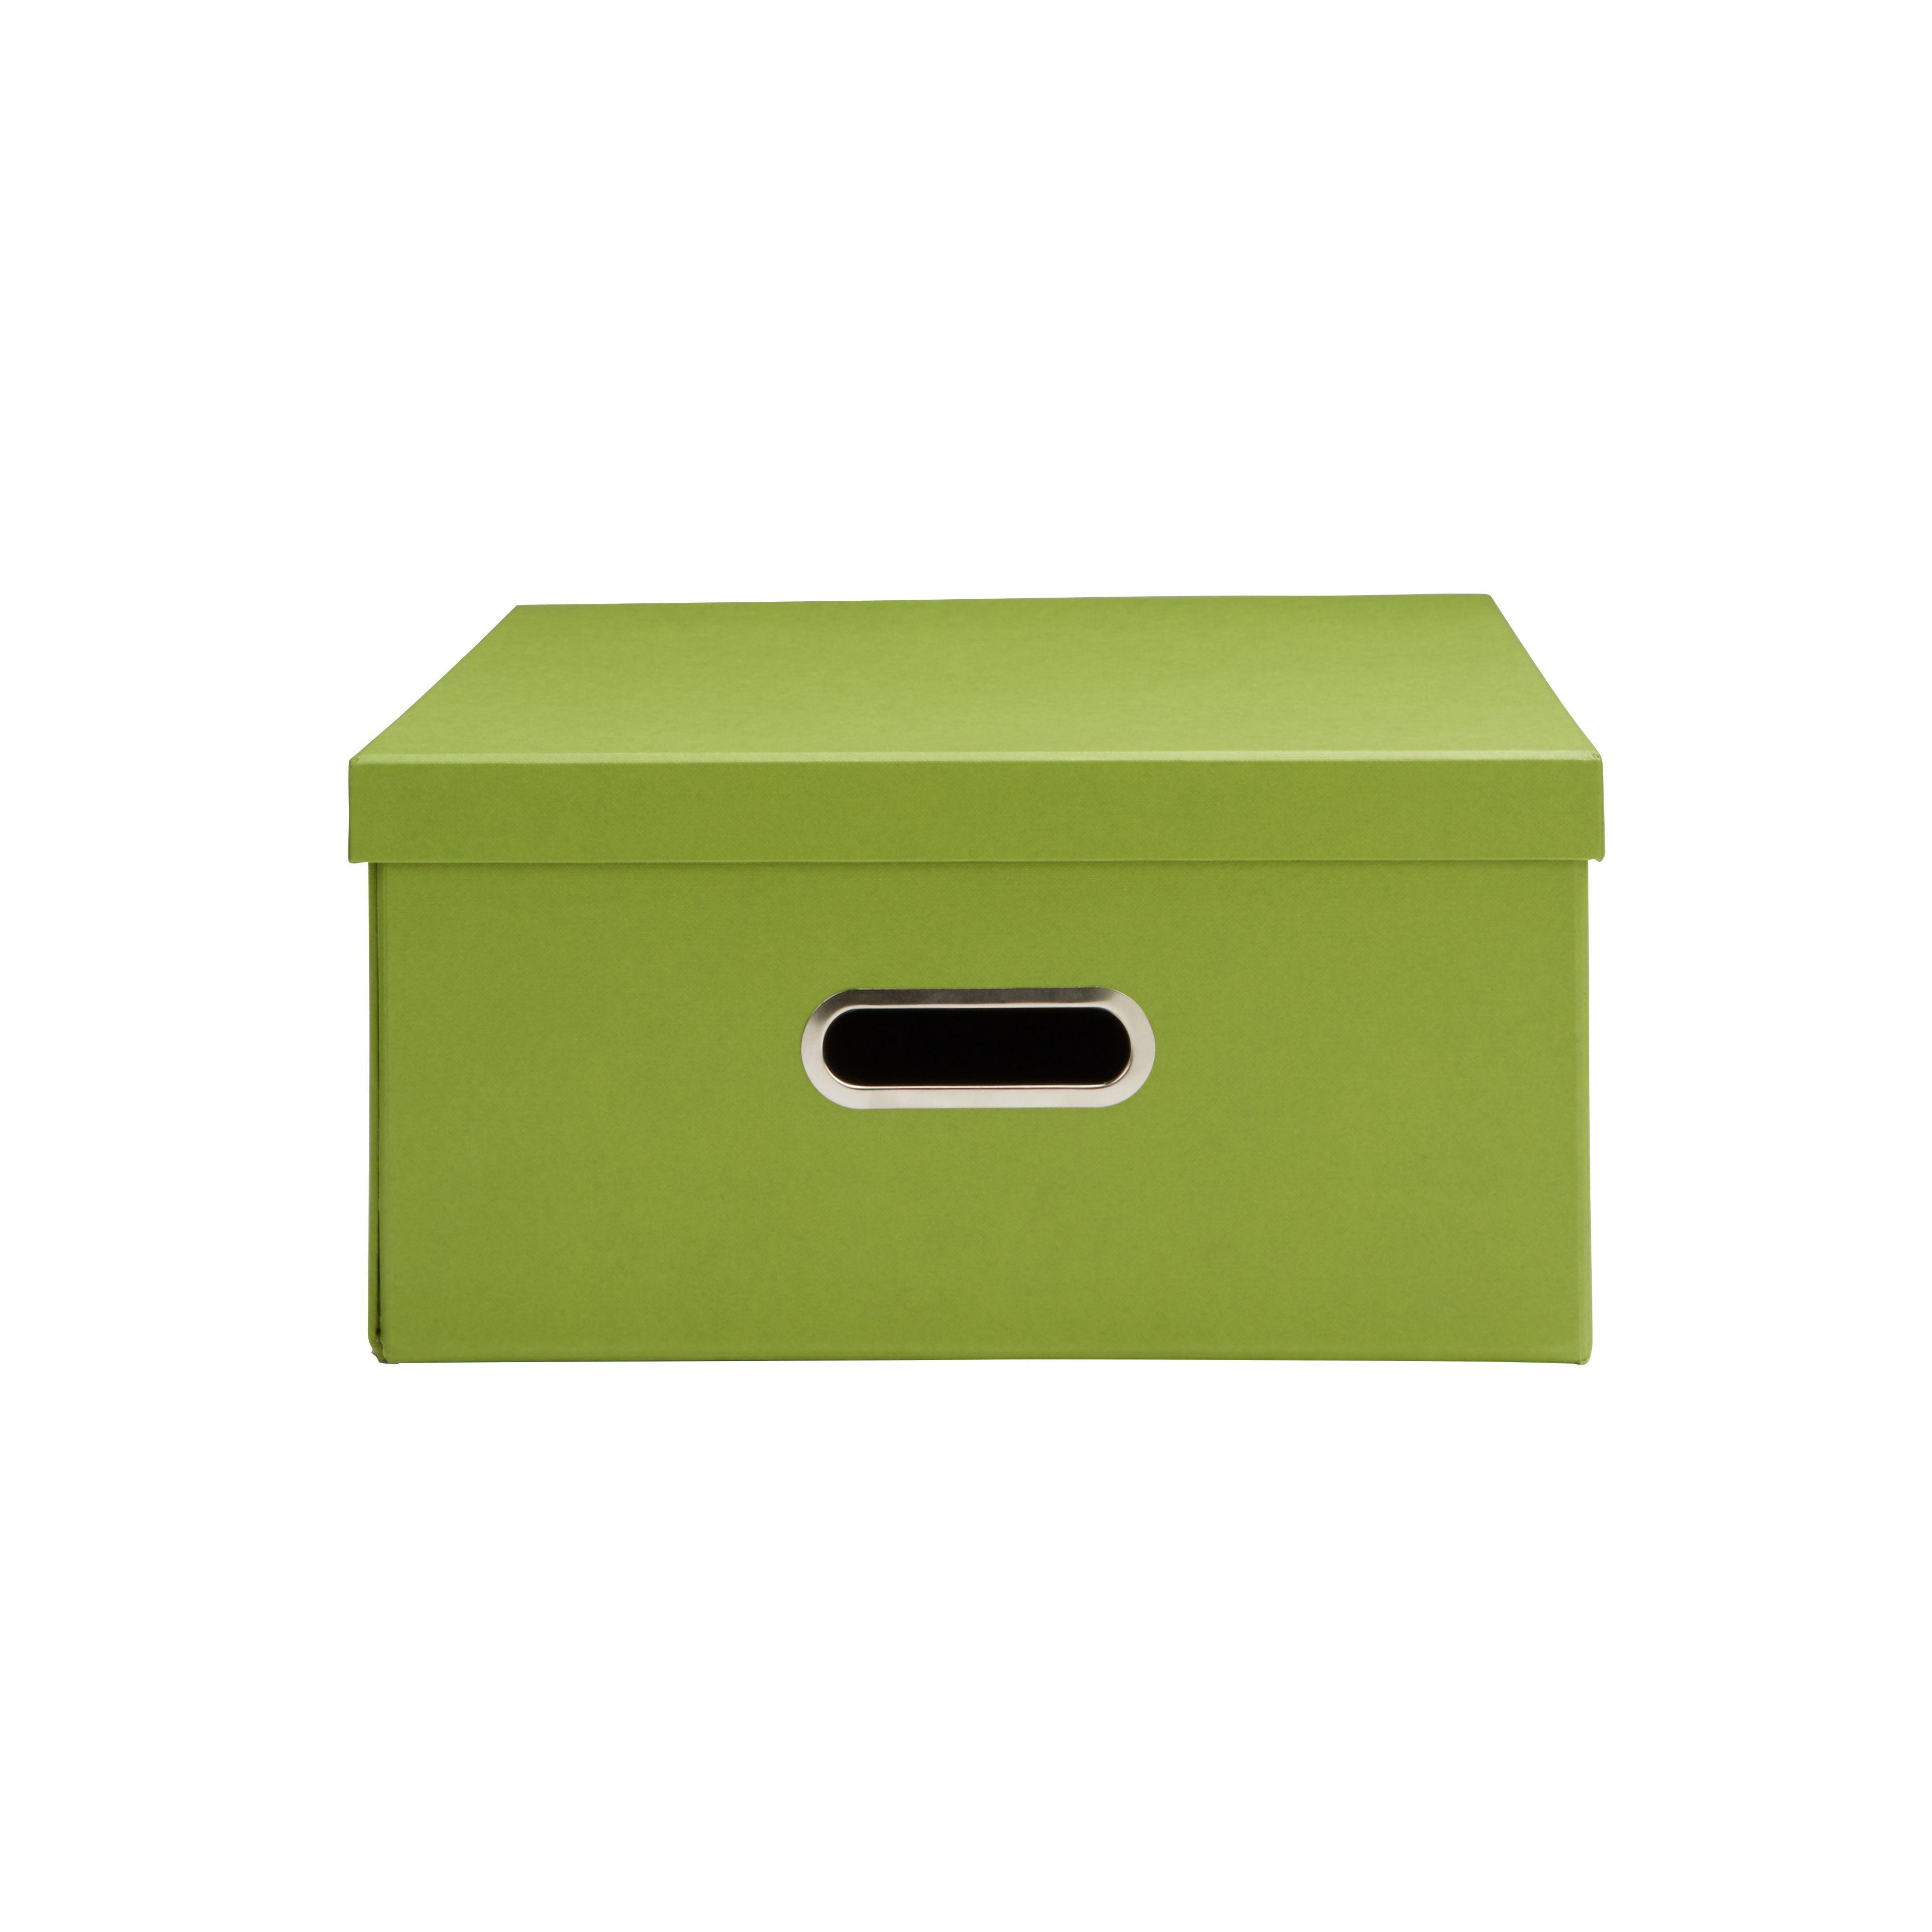 Green Cardboard Storage Box